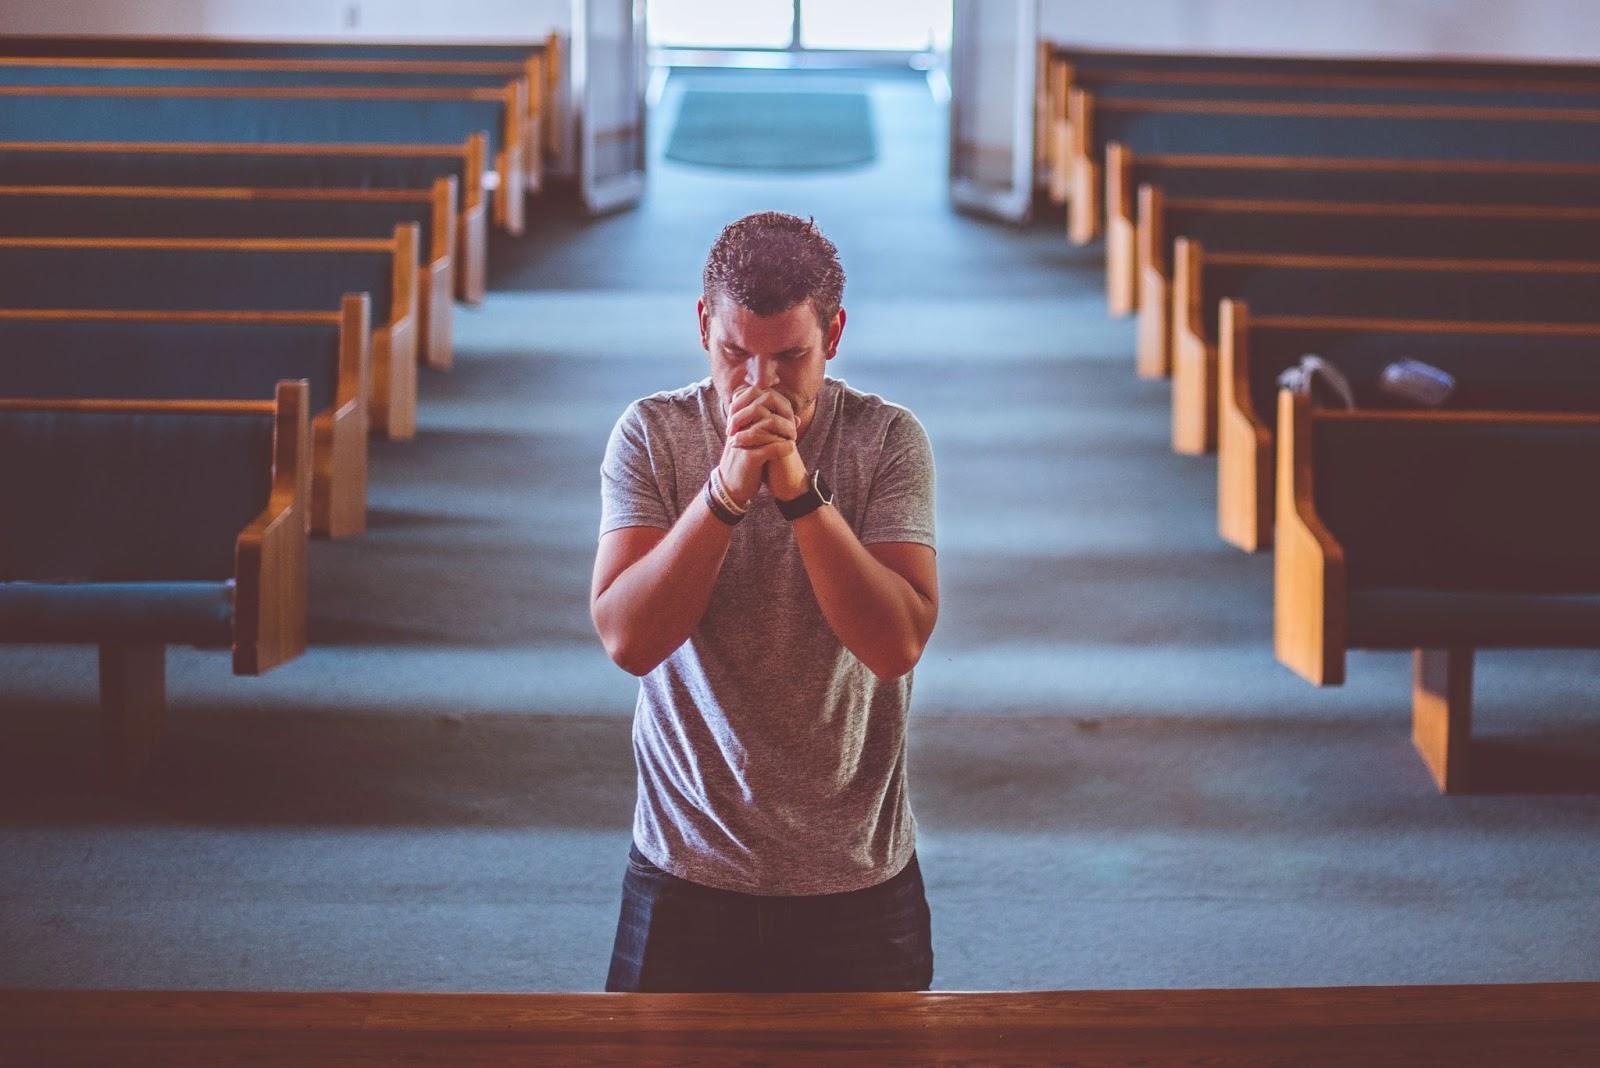 A man kneels in prayer in a church